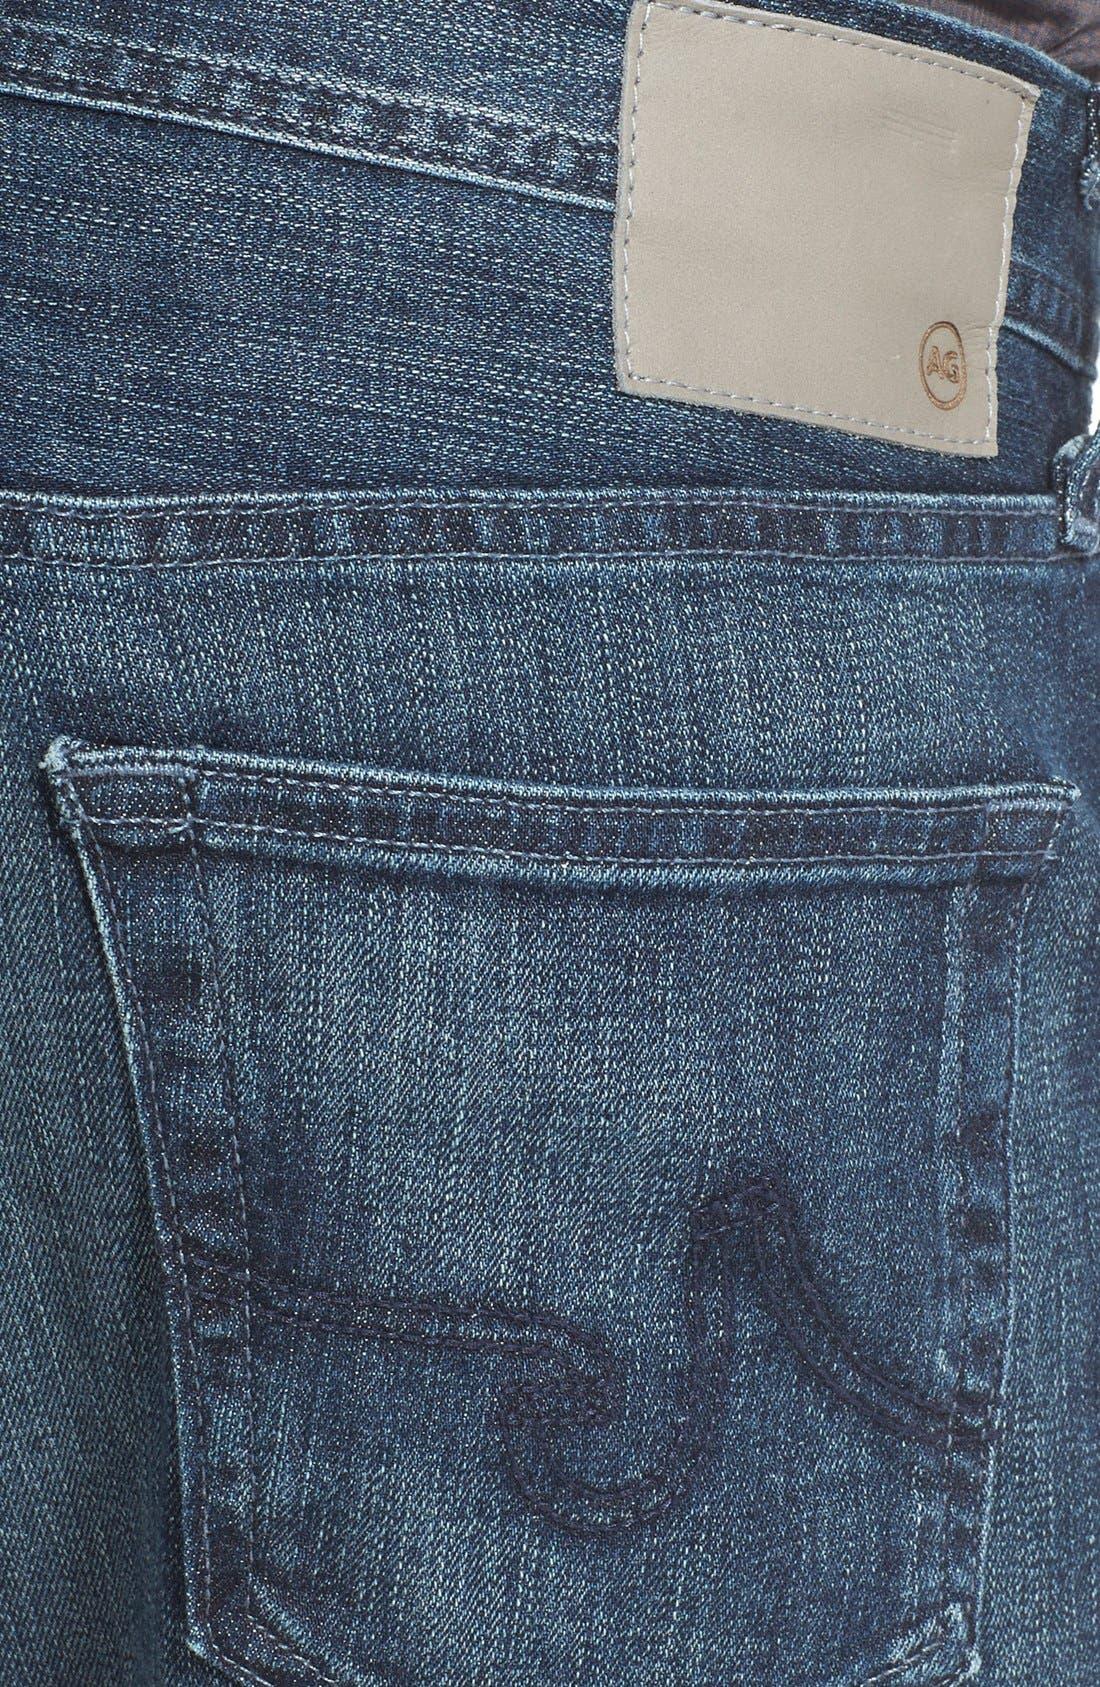 'Graduate' Slim Straight Leg Jeans,                             Alternate thumbnail 5, color,                             STALLOW